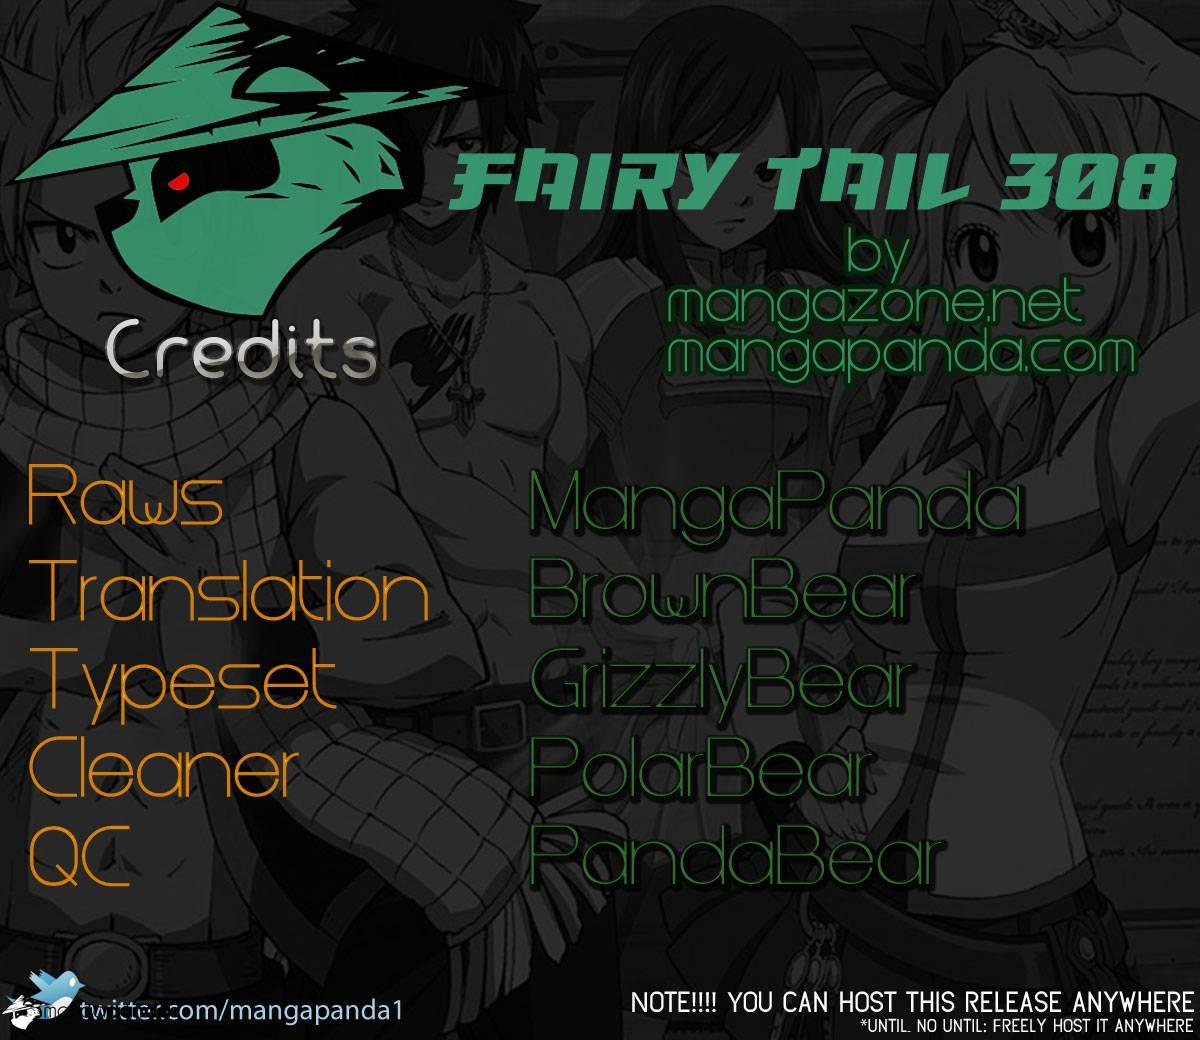 TruyenHay.Com - Ảnh 22 - Fairy Tail Chap 308